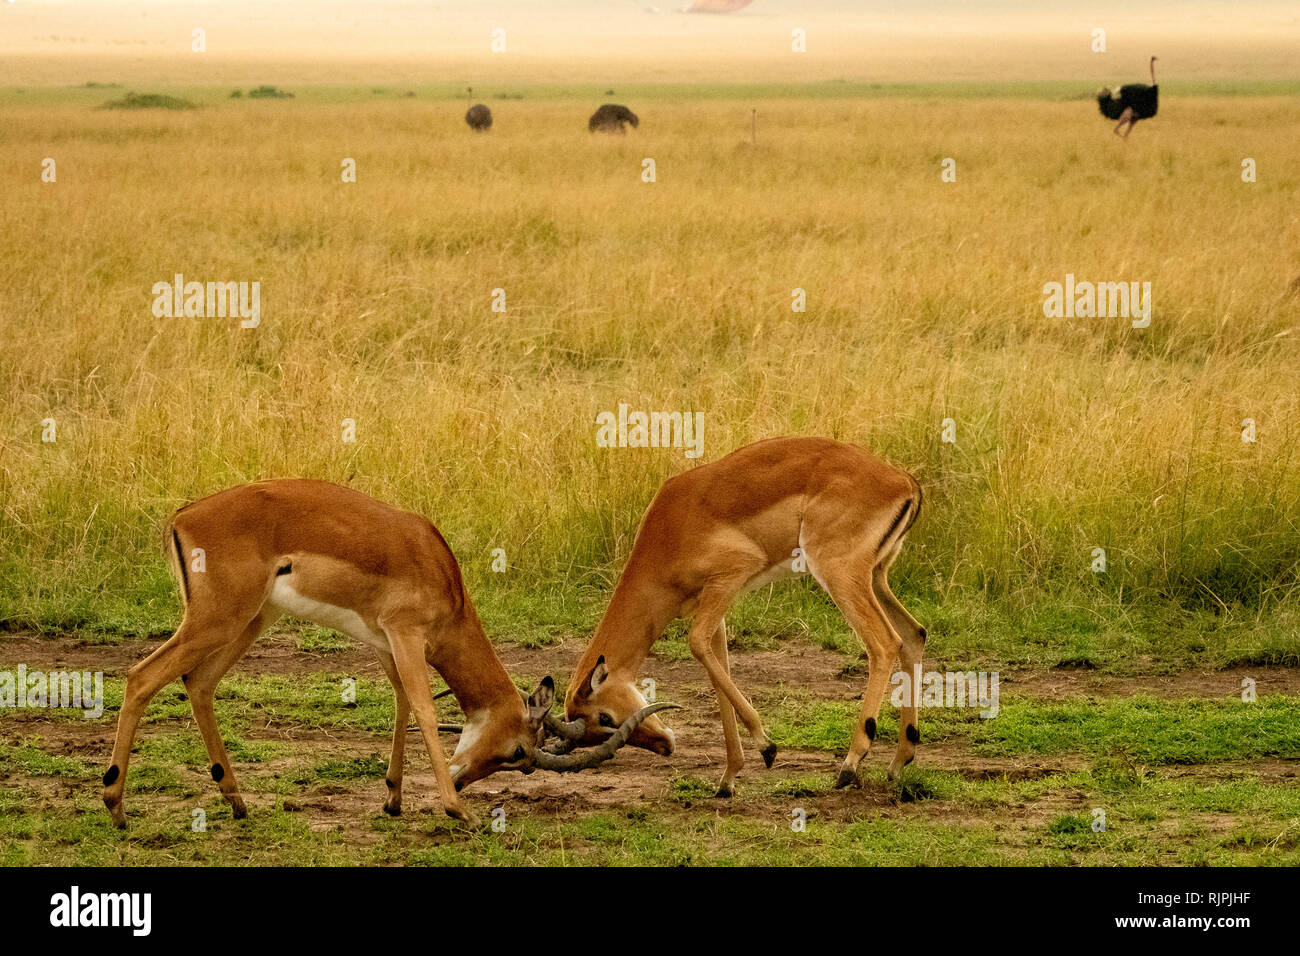 Two male impalas Aepyceros melampus rutting fighting in the masai mara in kenya - Stock Image